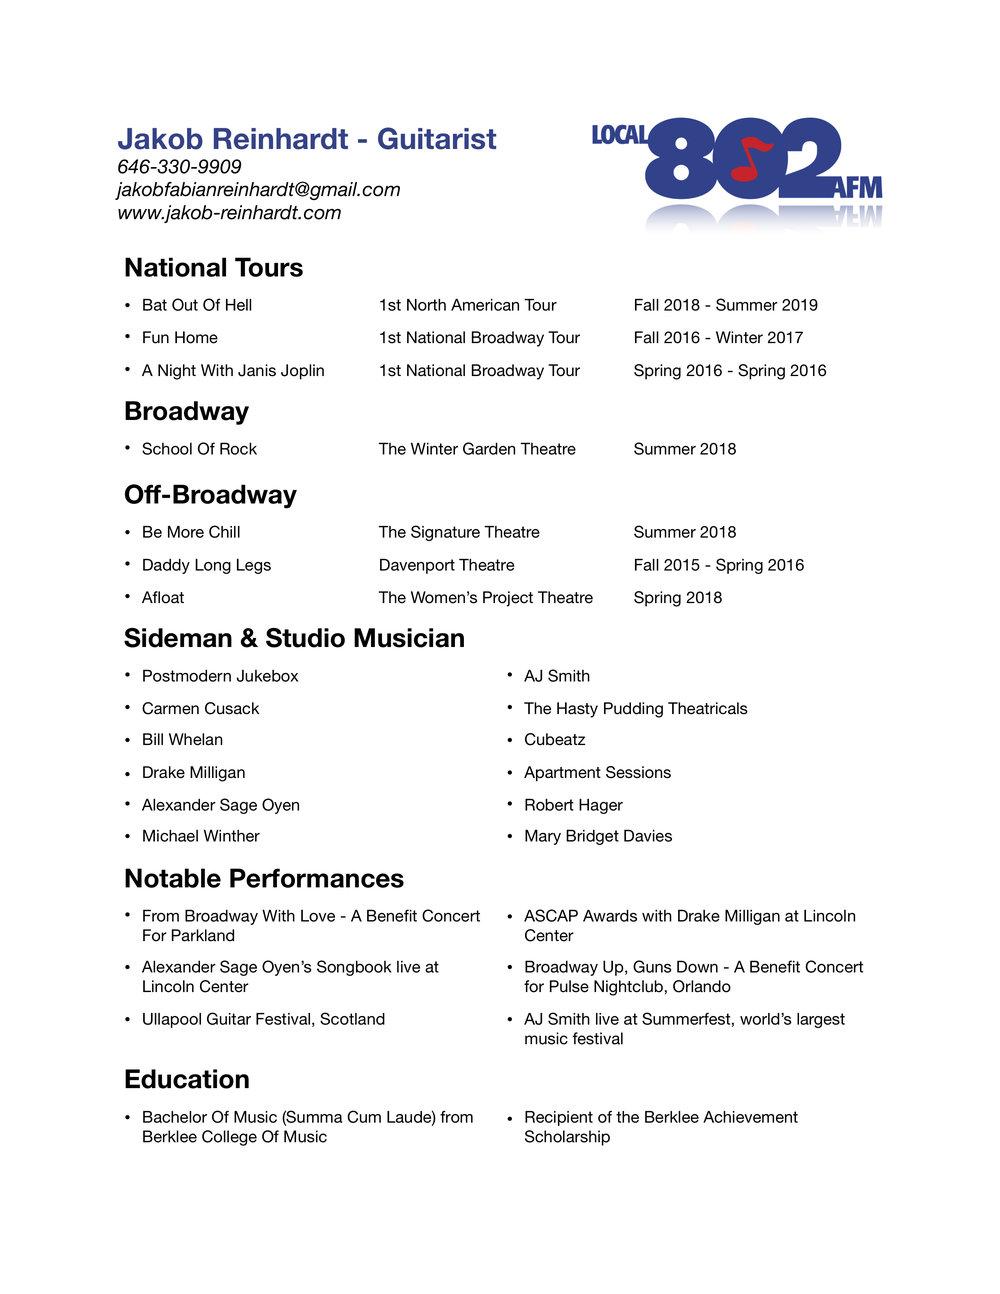 Resume Aug '18.jpg